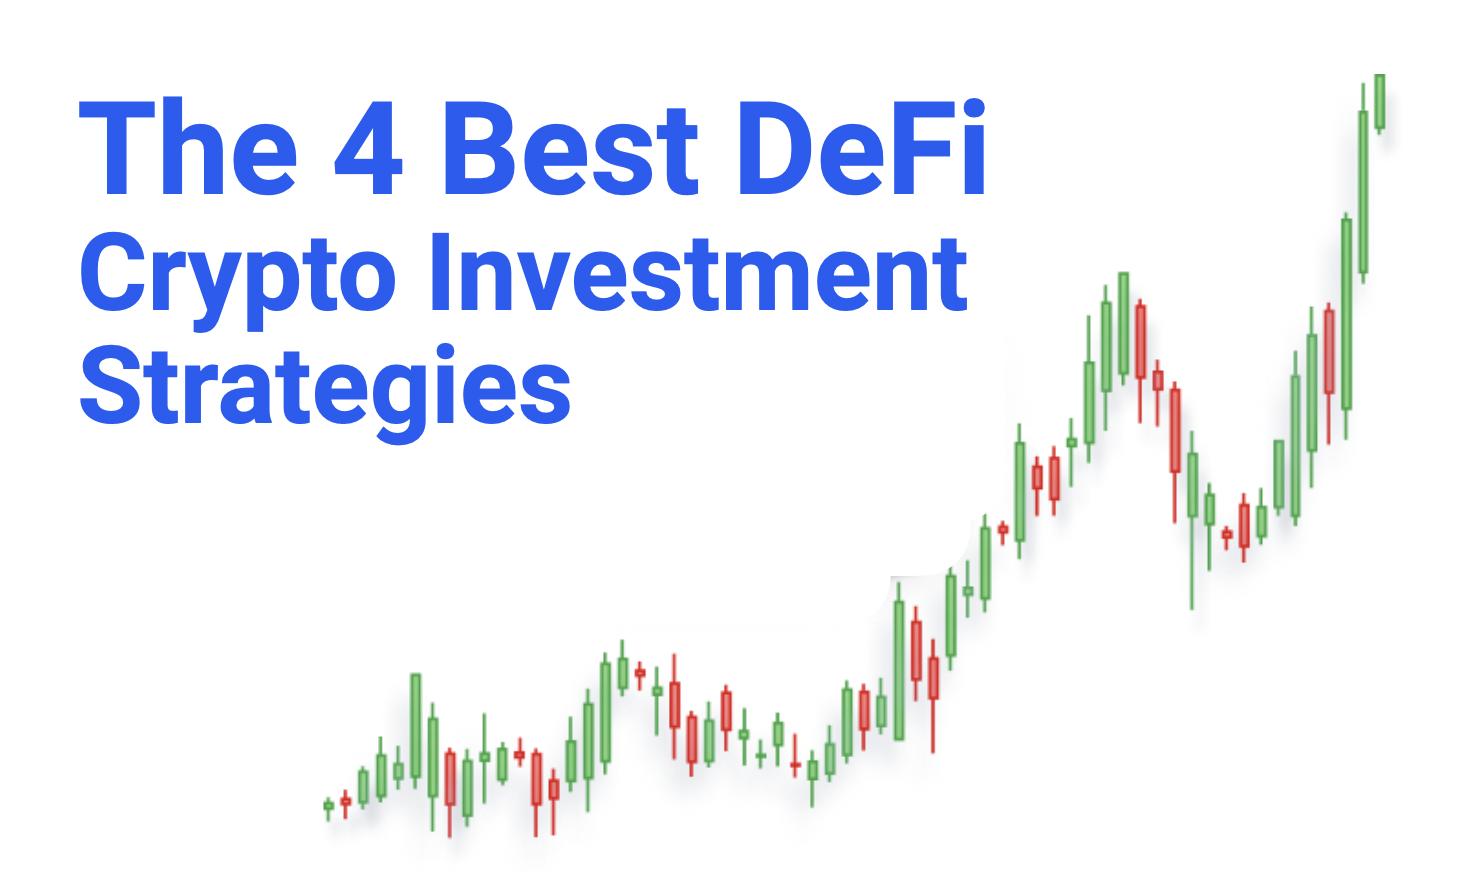 Best DeFi Crypto